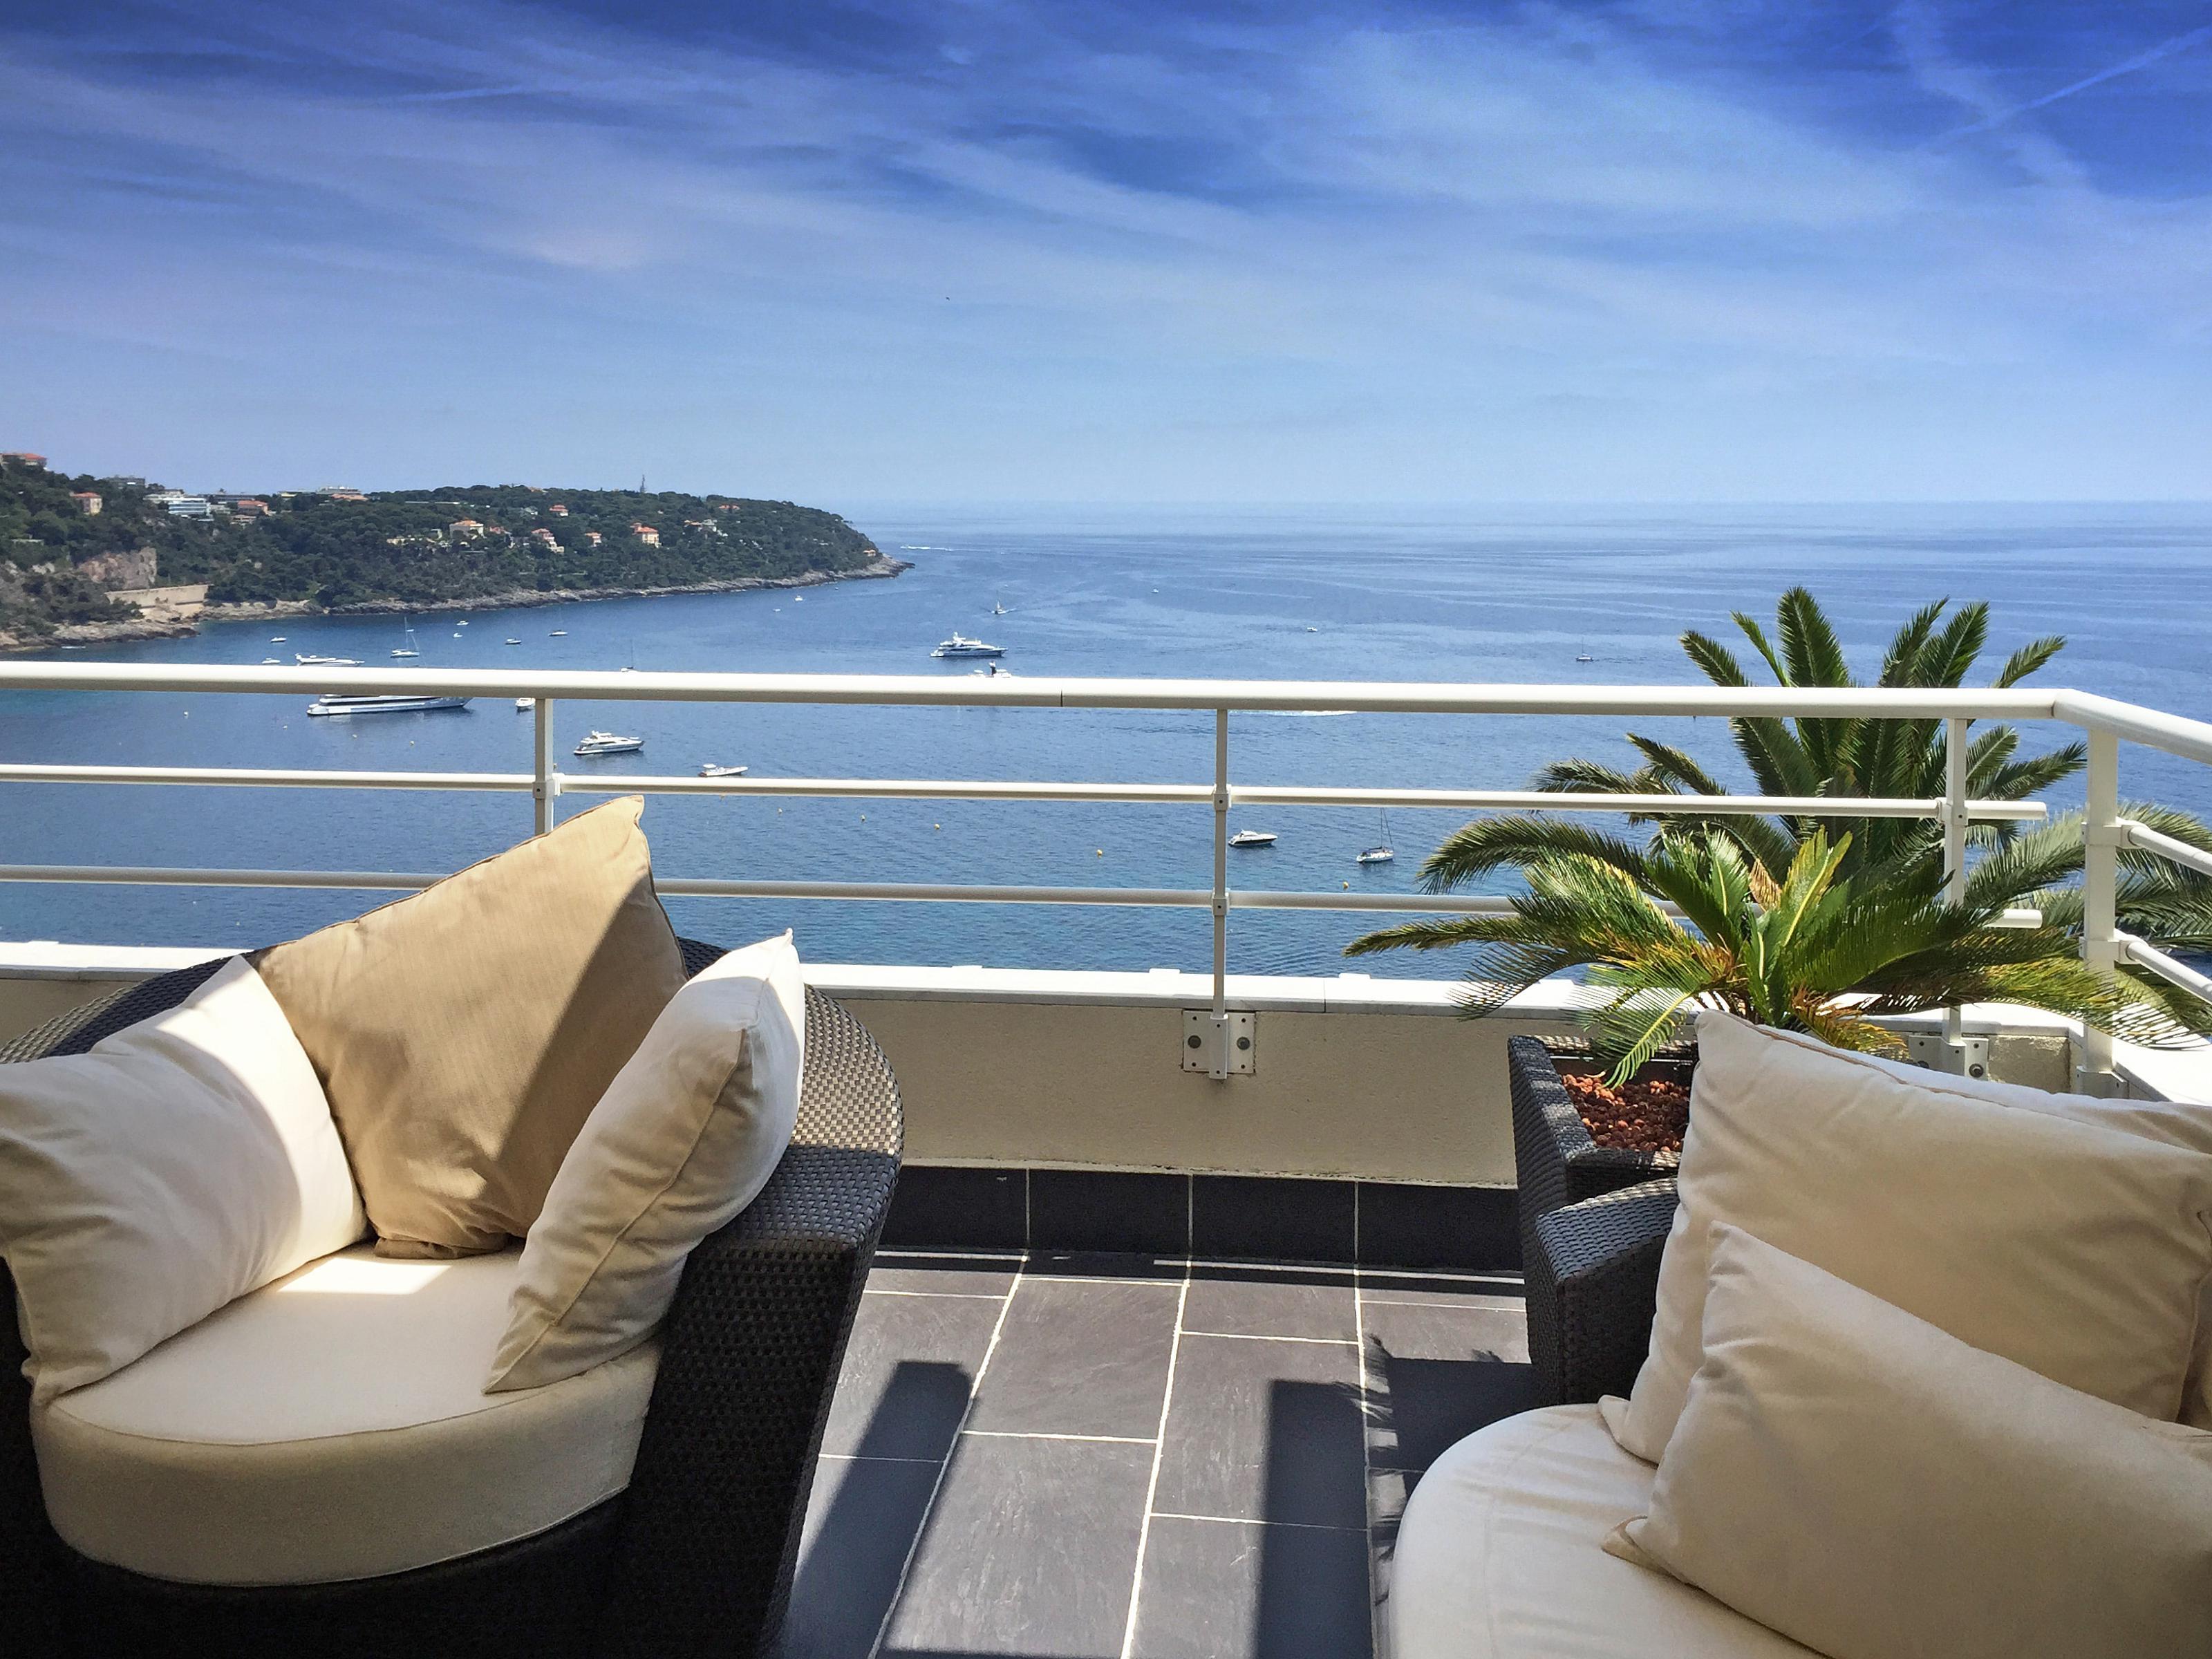 Single Family Home for Sale at Luxury duplex penthouse facing Cap Martin Roquebrune Cap Martin Roquebrune Cap Martin, Provence-Alpes-Cote D'Azur 06190 France